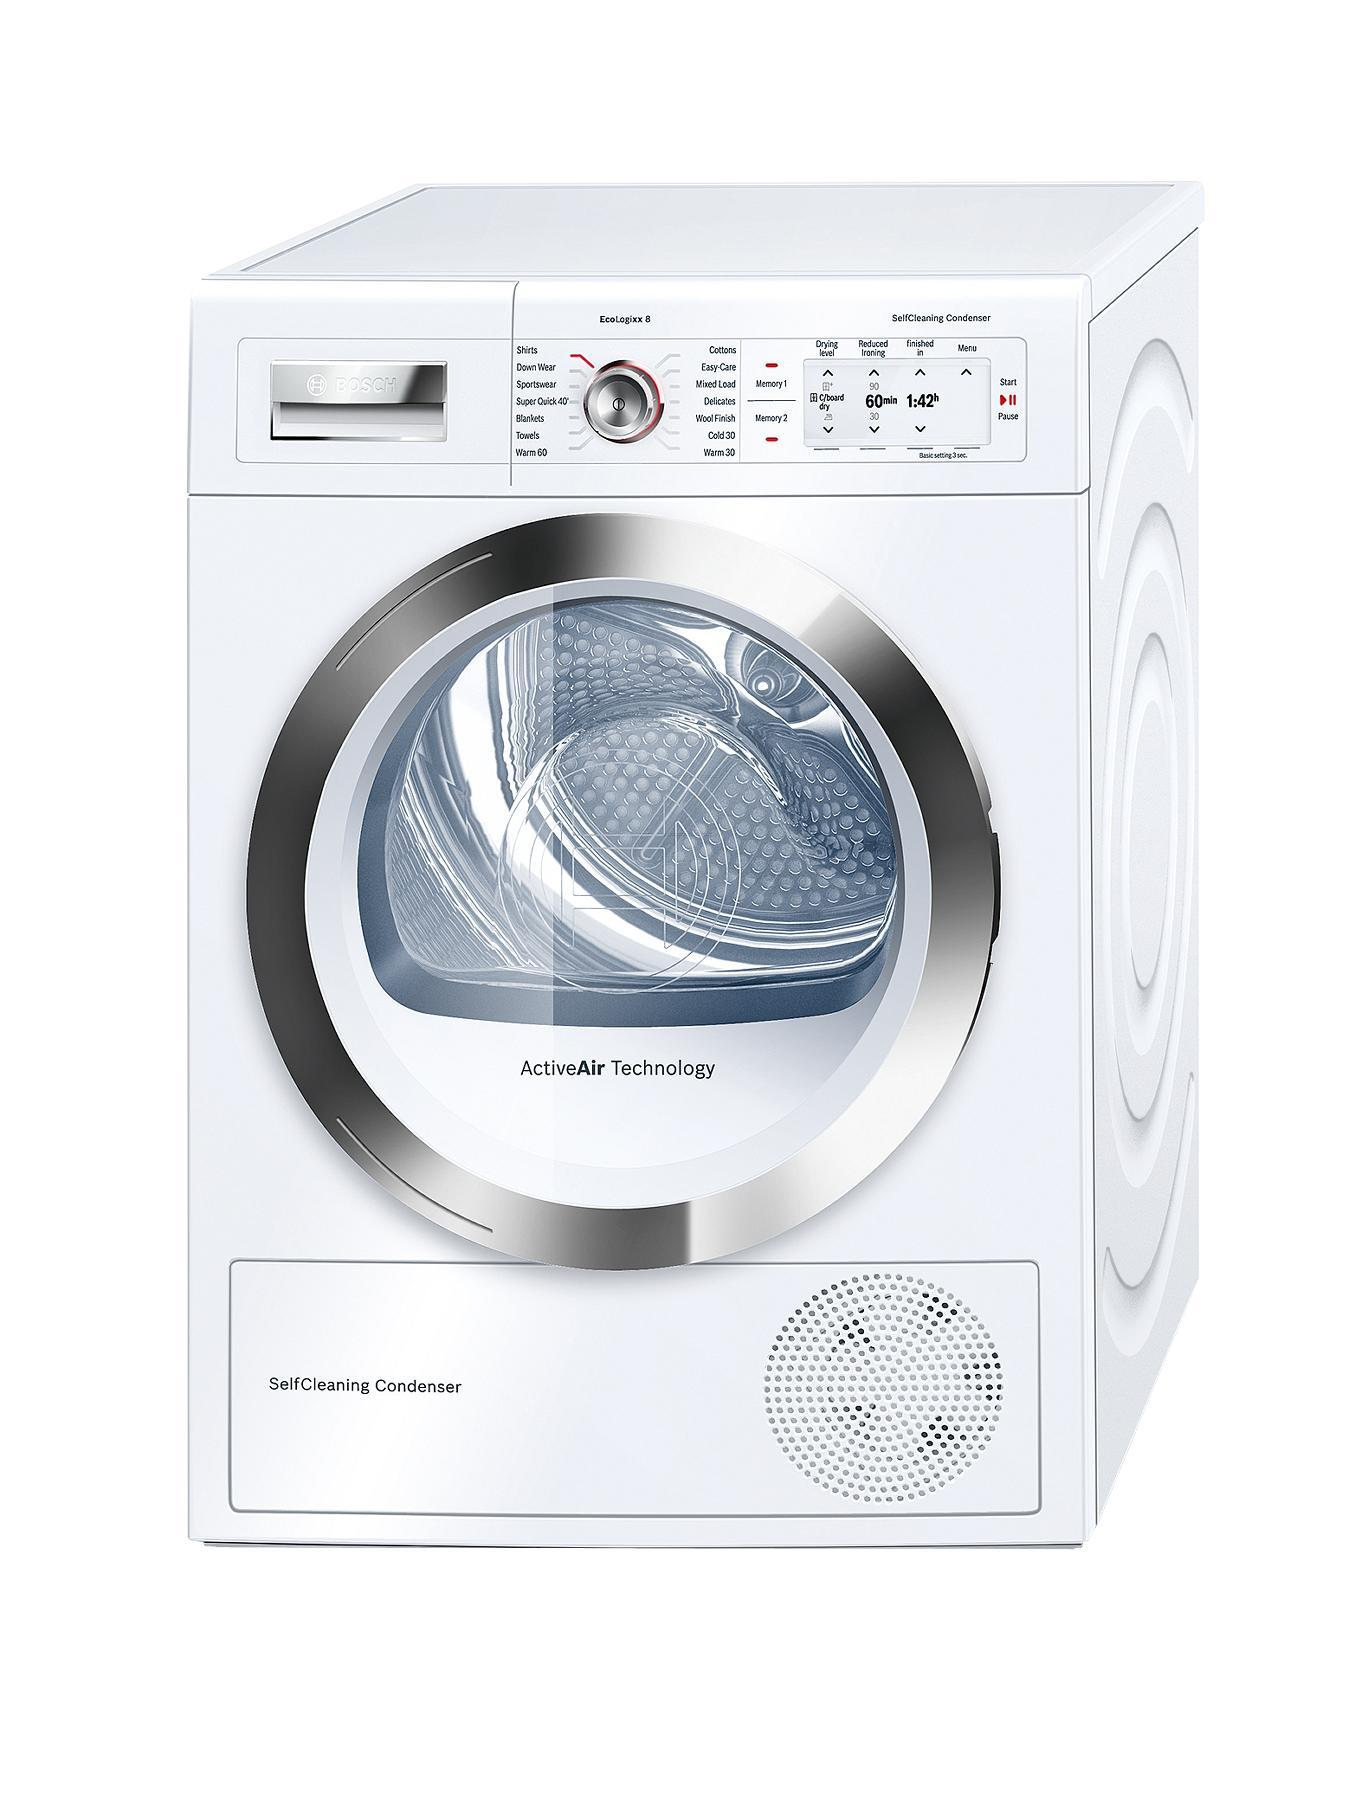 Bosch Eco Logixx WTY86790Gb 8kg Load Condenser Tumble Dryer - White